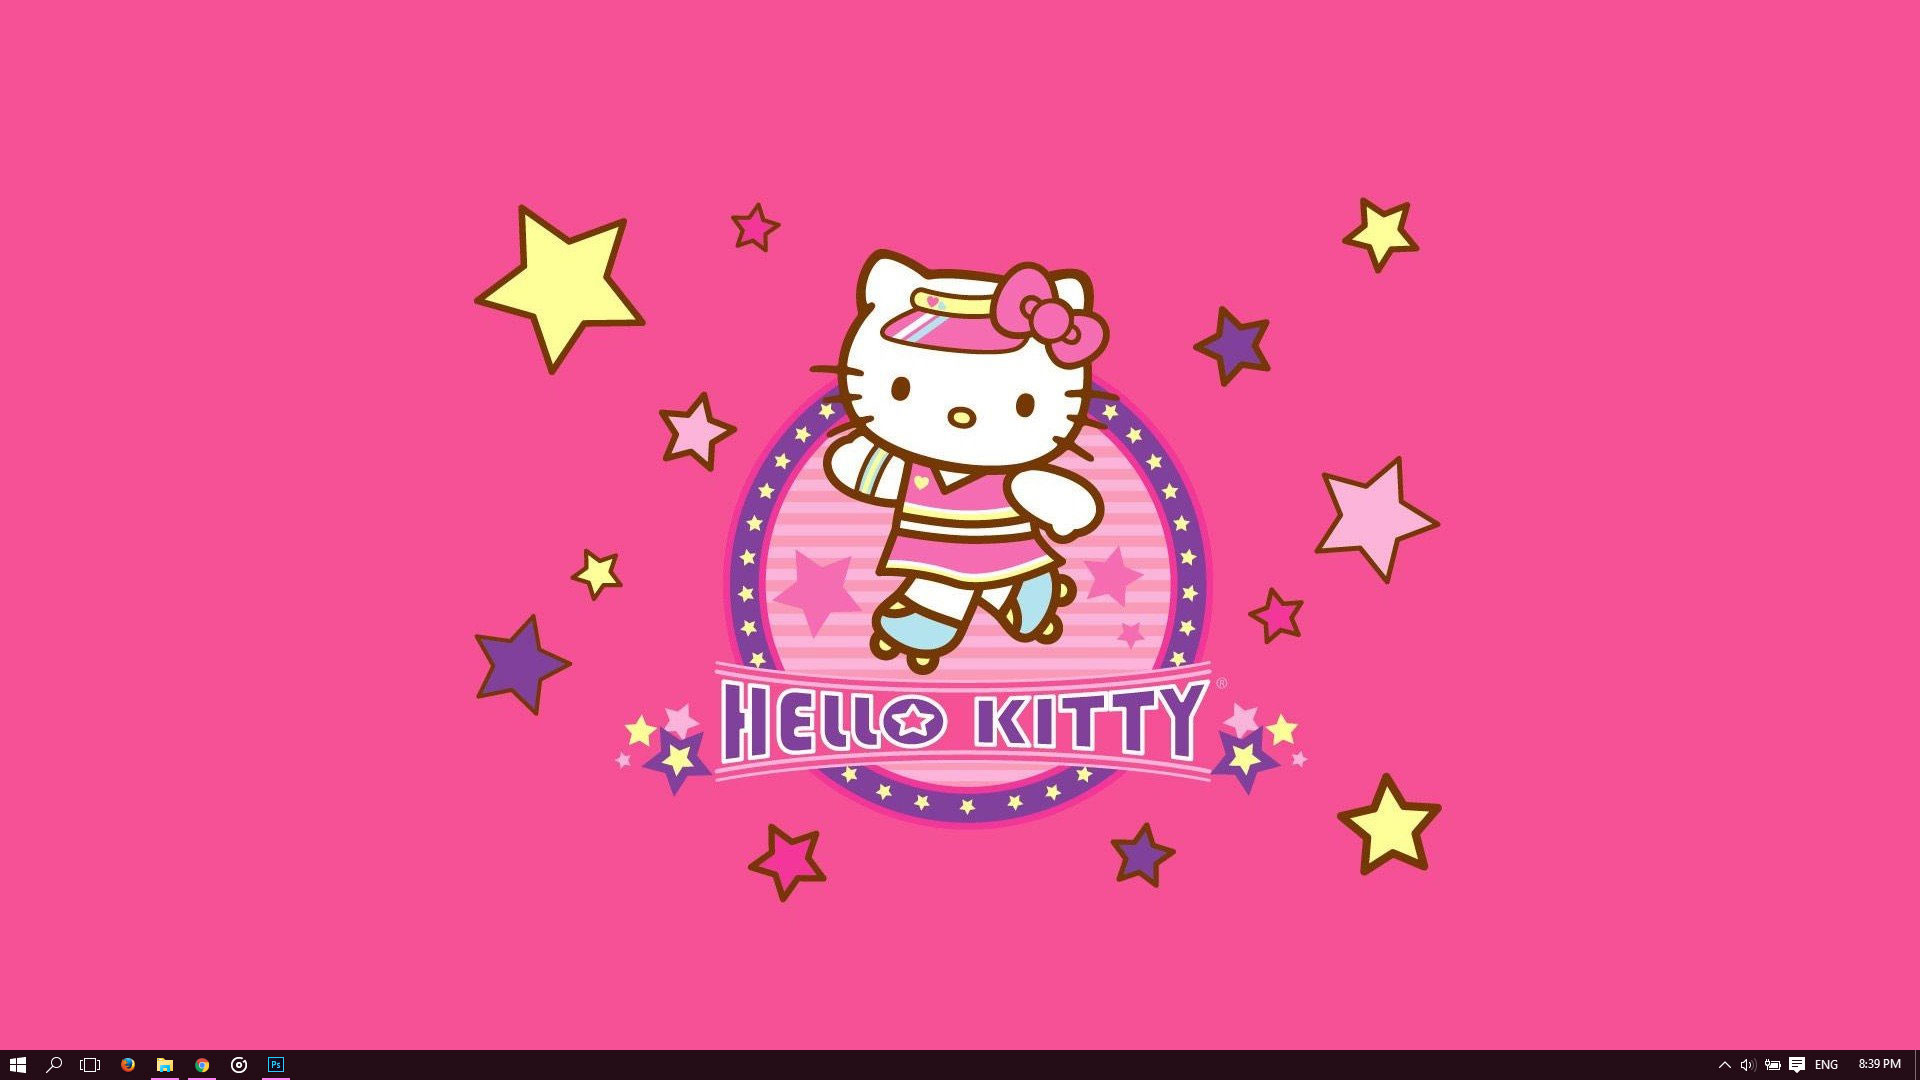 Popular Wallpaper Hello Kitty Ipad 2 - 725721-popular-hello-kitty-desktop-backgrounds-1920x1080-for-ipad-2  Pictures_453923.jpg